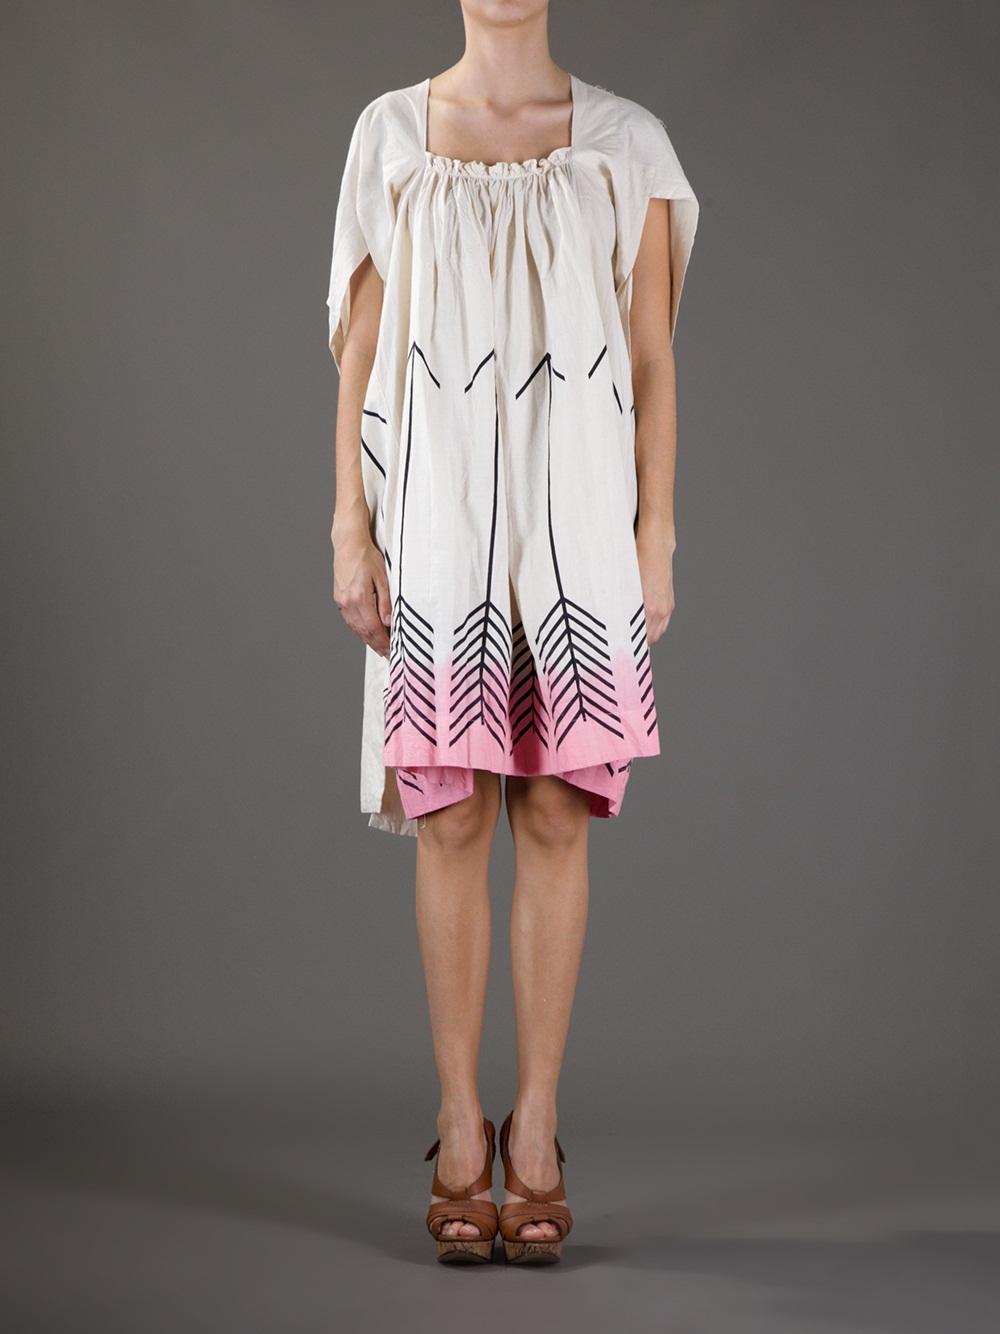 Lyst Bernhard Willhelm Arrow Print Dress In Natural